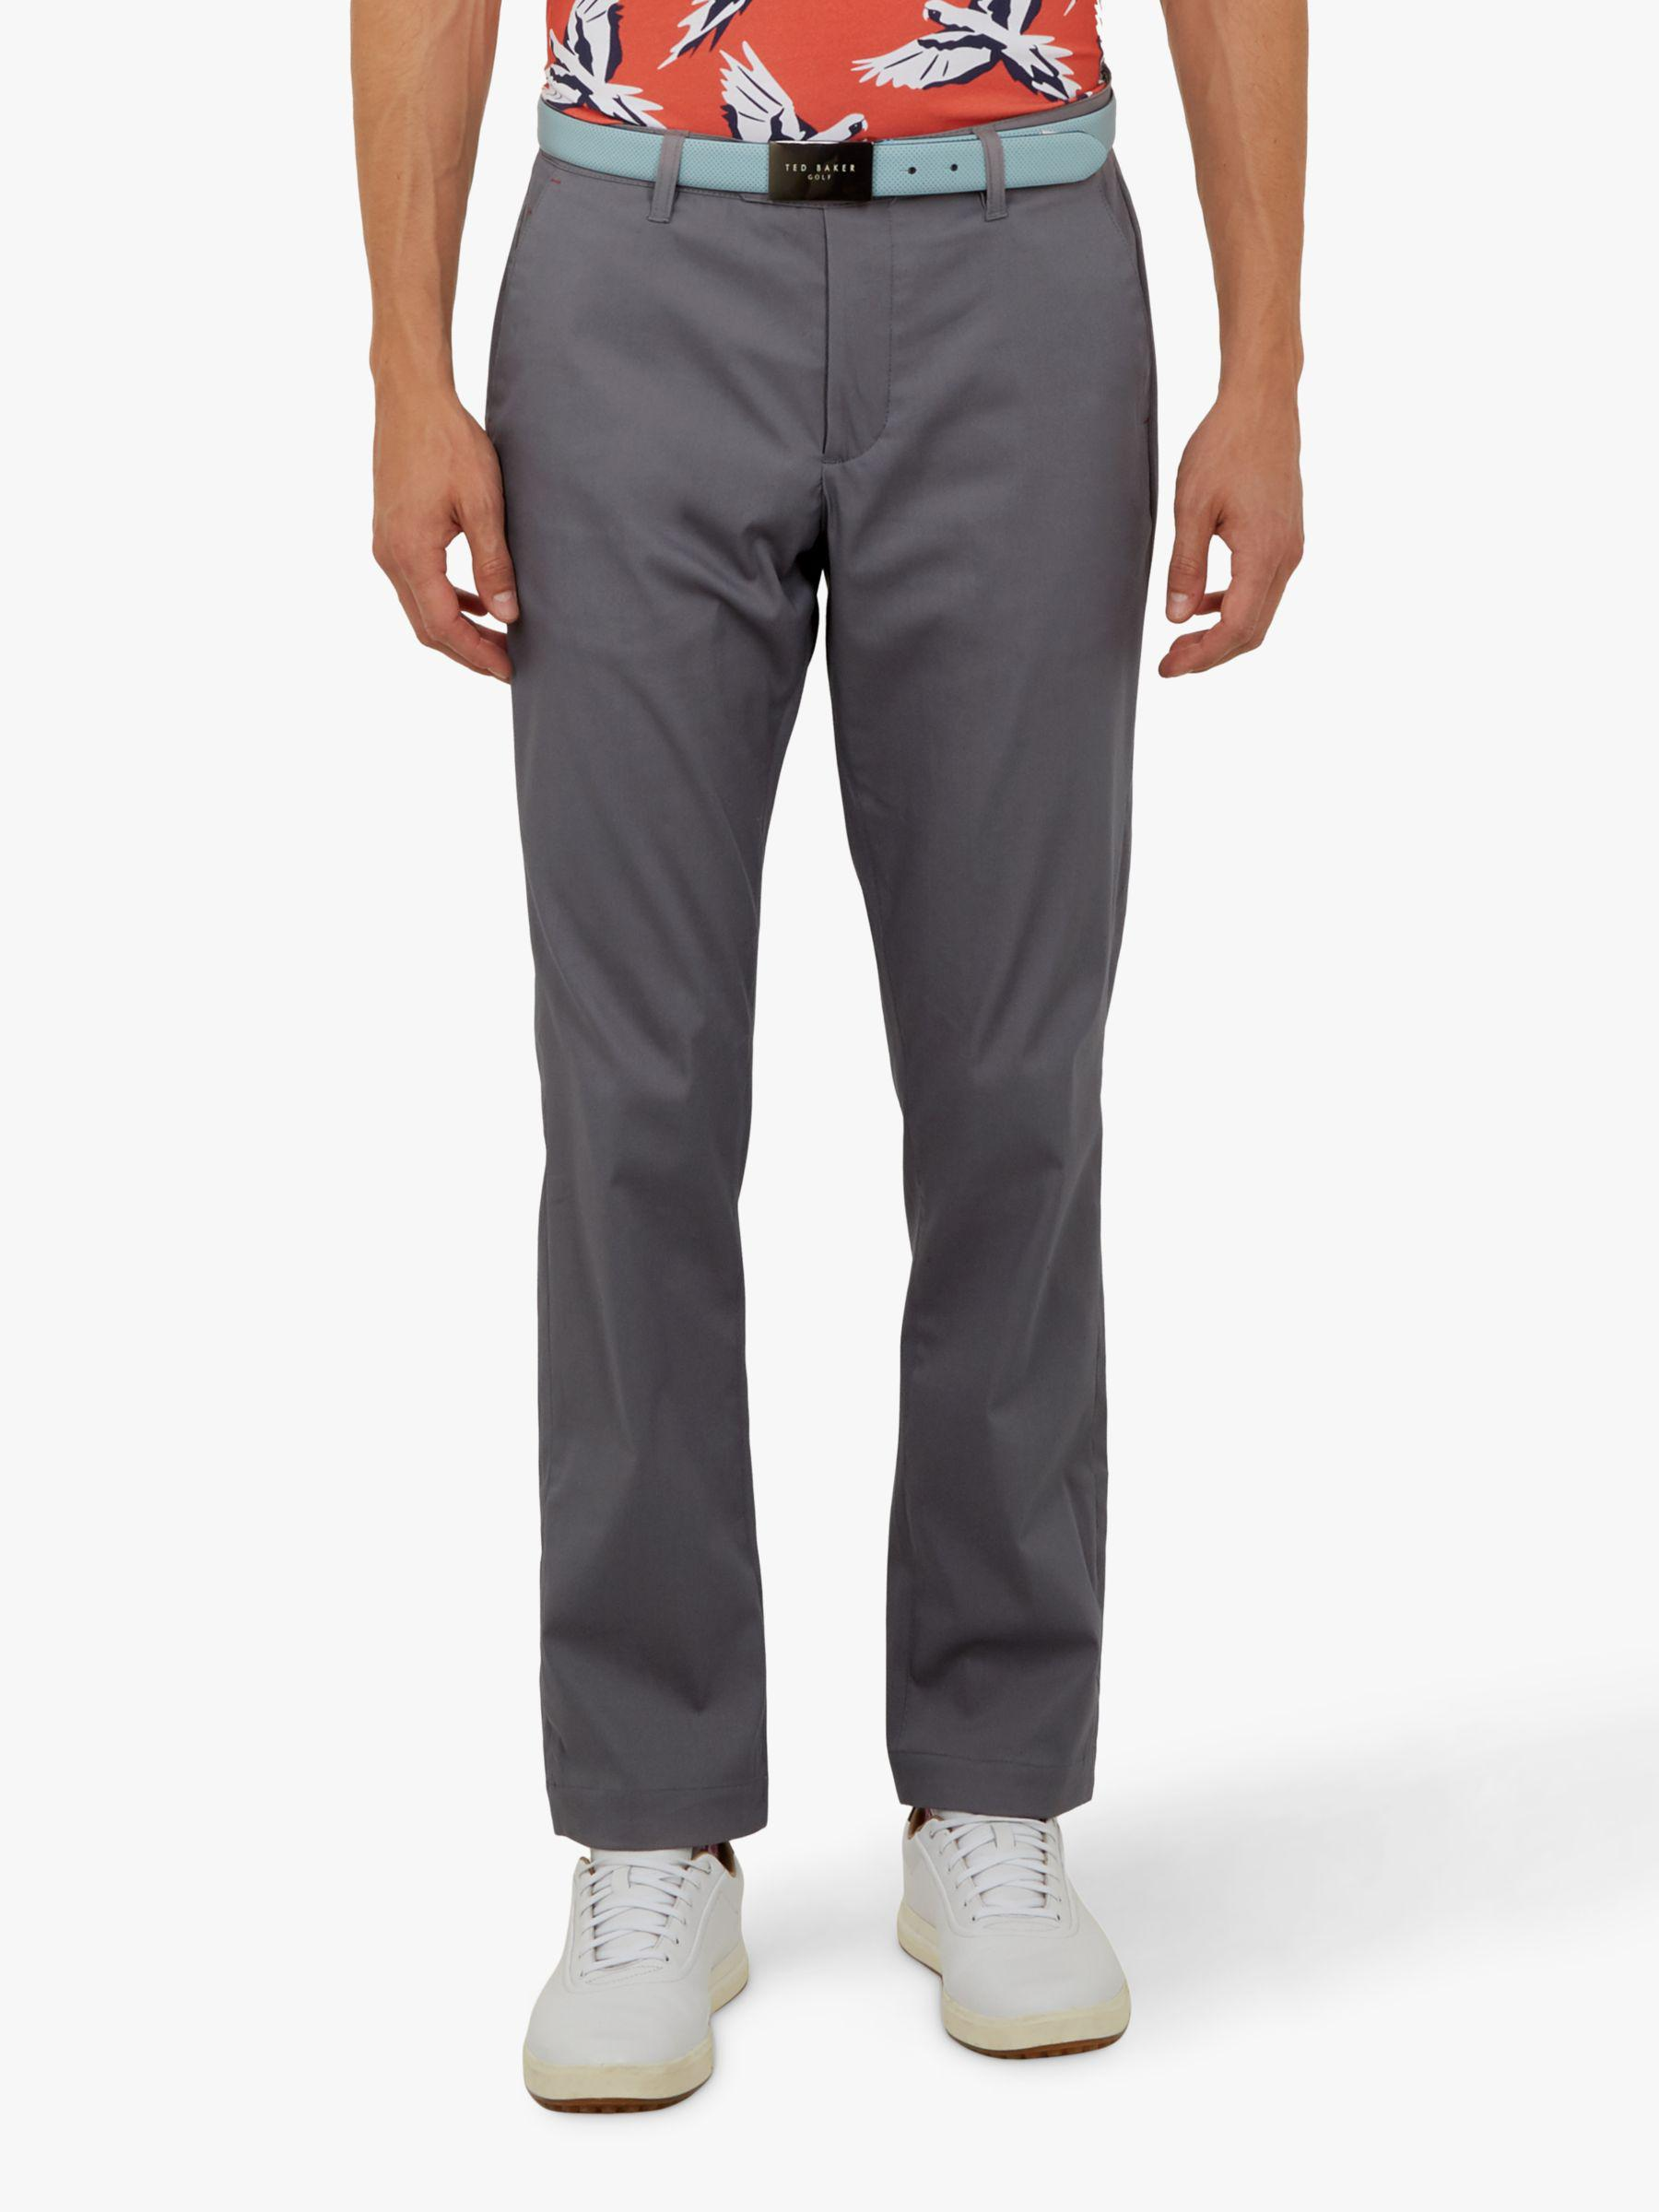 a4b267286f7640 Ted Baker - Gray Golf Jagur Trousers for Men - Lyst. View fullscreen